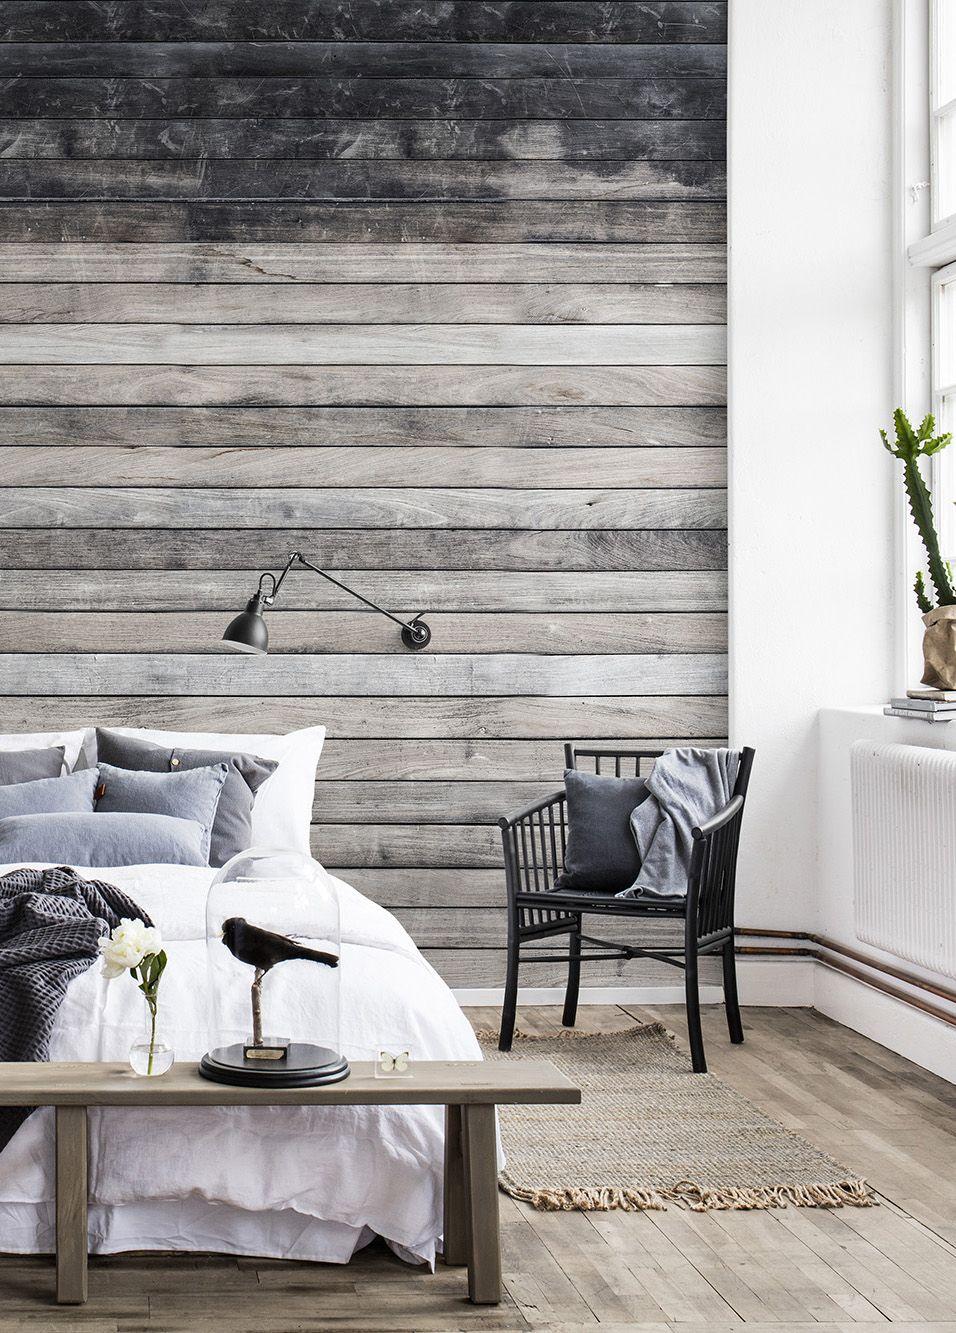 Full Size of Tapetentrends 2020 Wohnzimmer Moderne Tapeten Trends Worn Wood In Schlafzimmer Tapete Heizkörper Led Deckenleuchte Deckenstrahler Deckenlampen Poster Kamin Wohnzimmer Tapeten 2020 Wohnzimmer